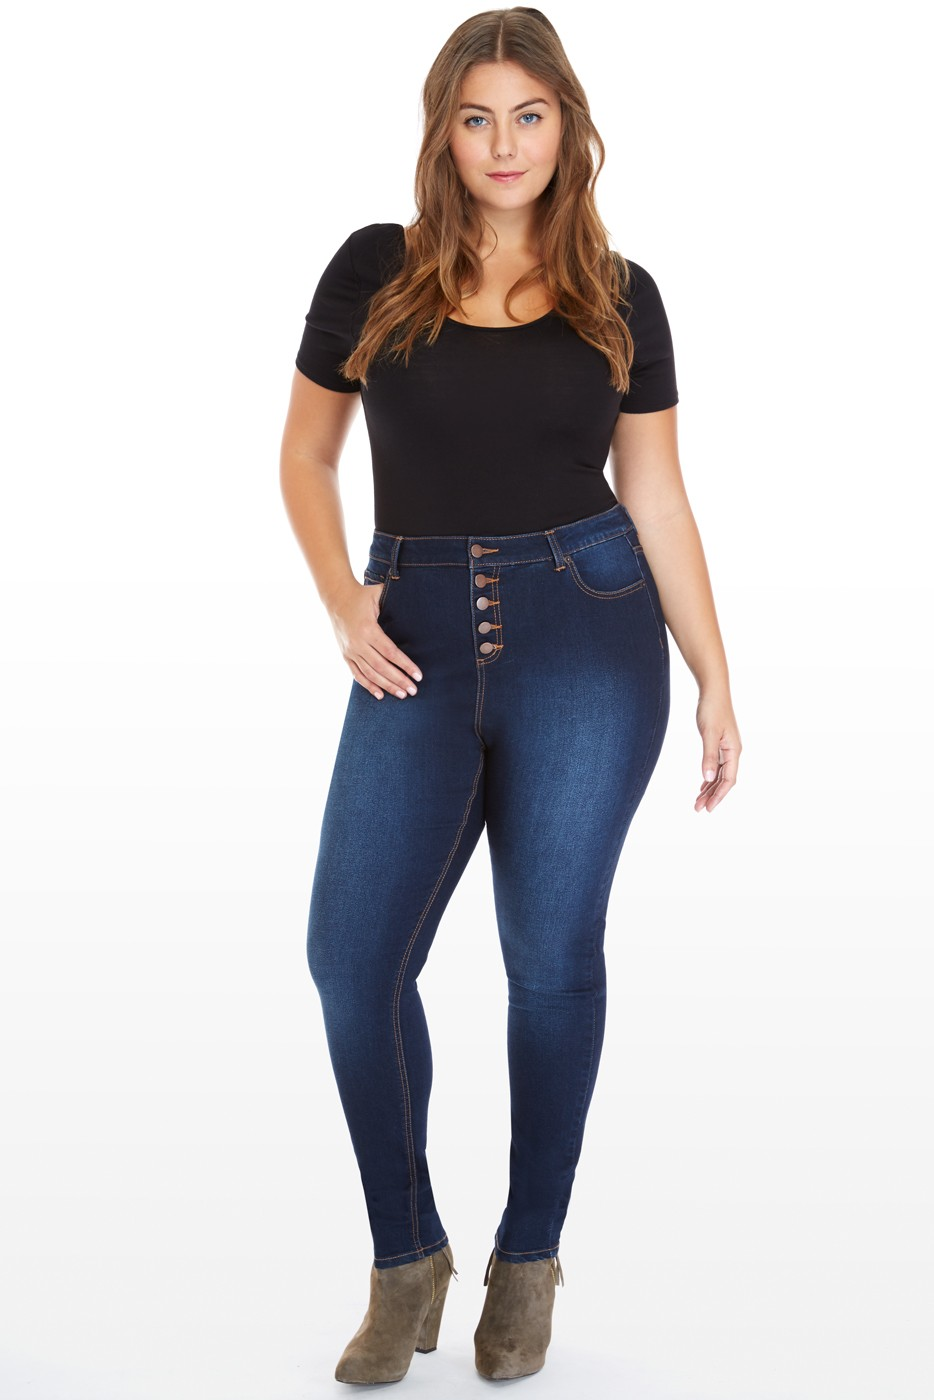 ftf high waist